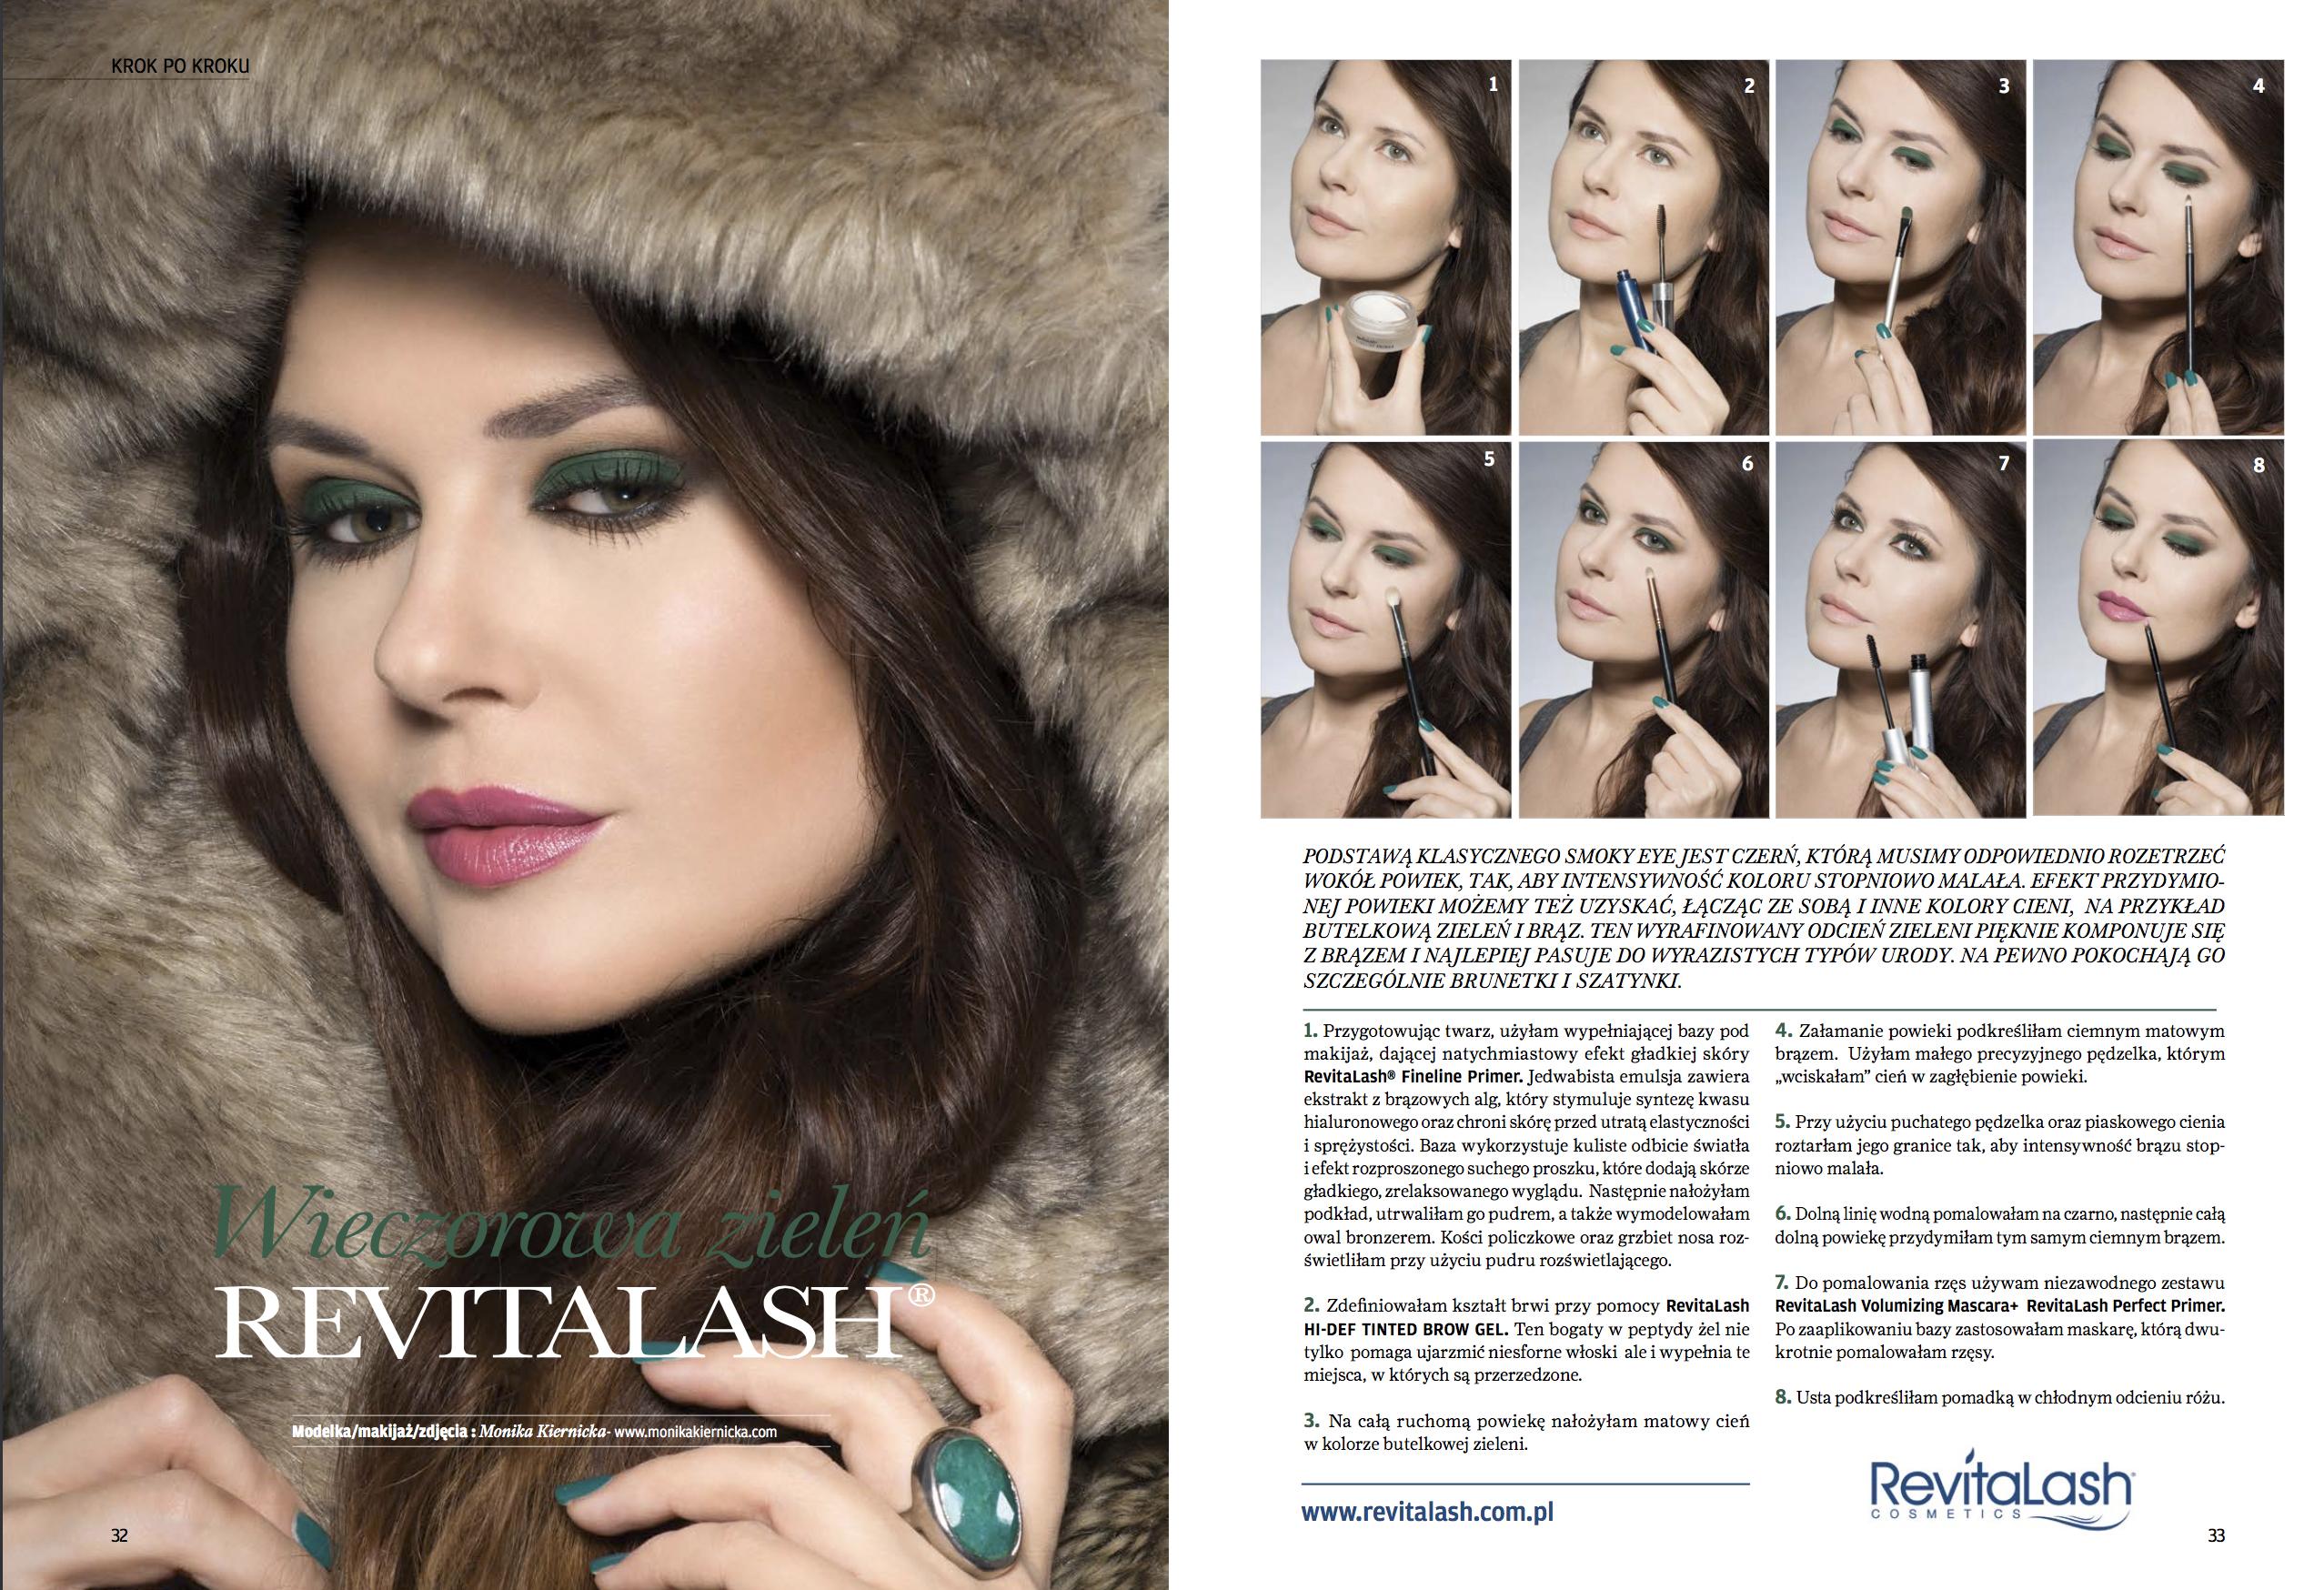 RevitaLash advertisement - Make-up Trendy Magazine 12/2015